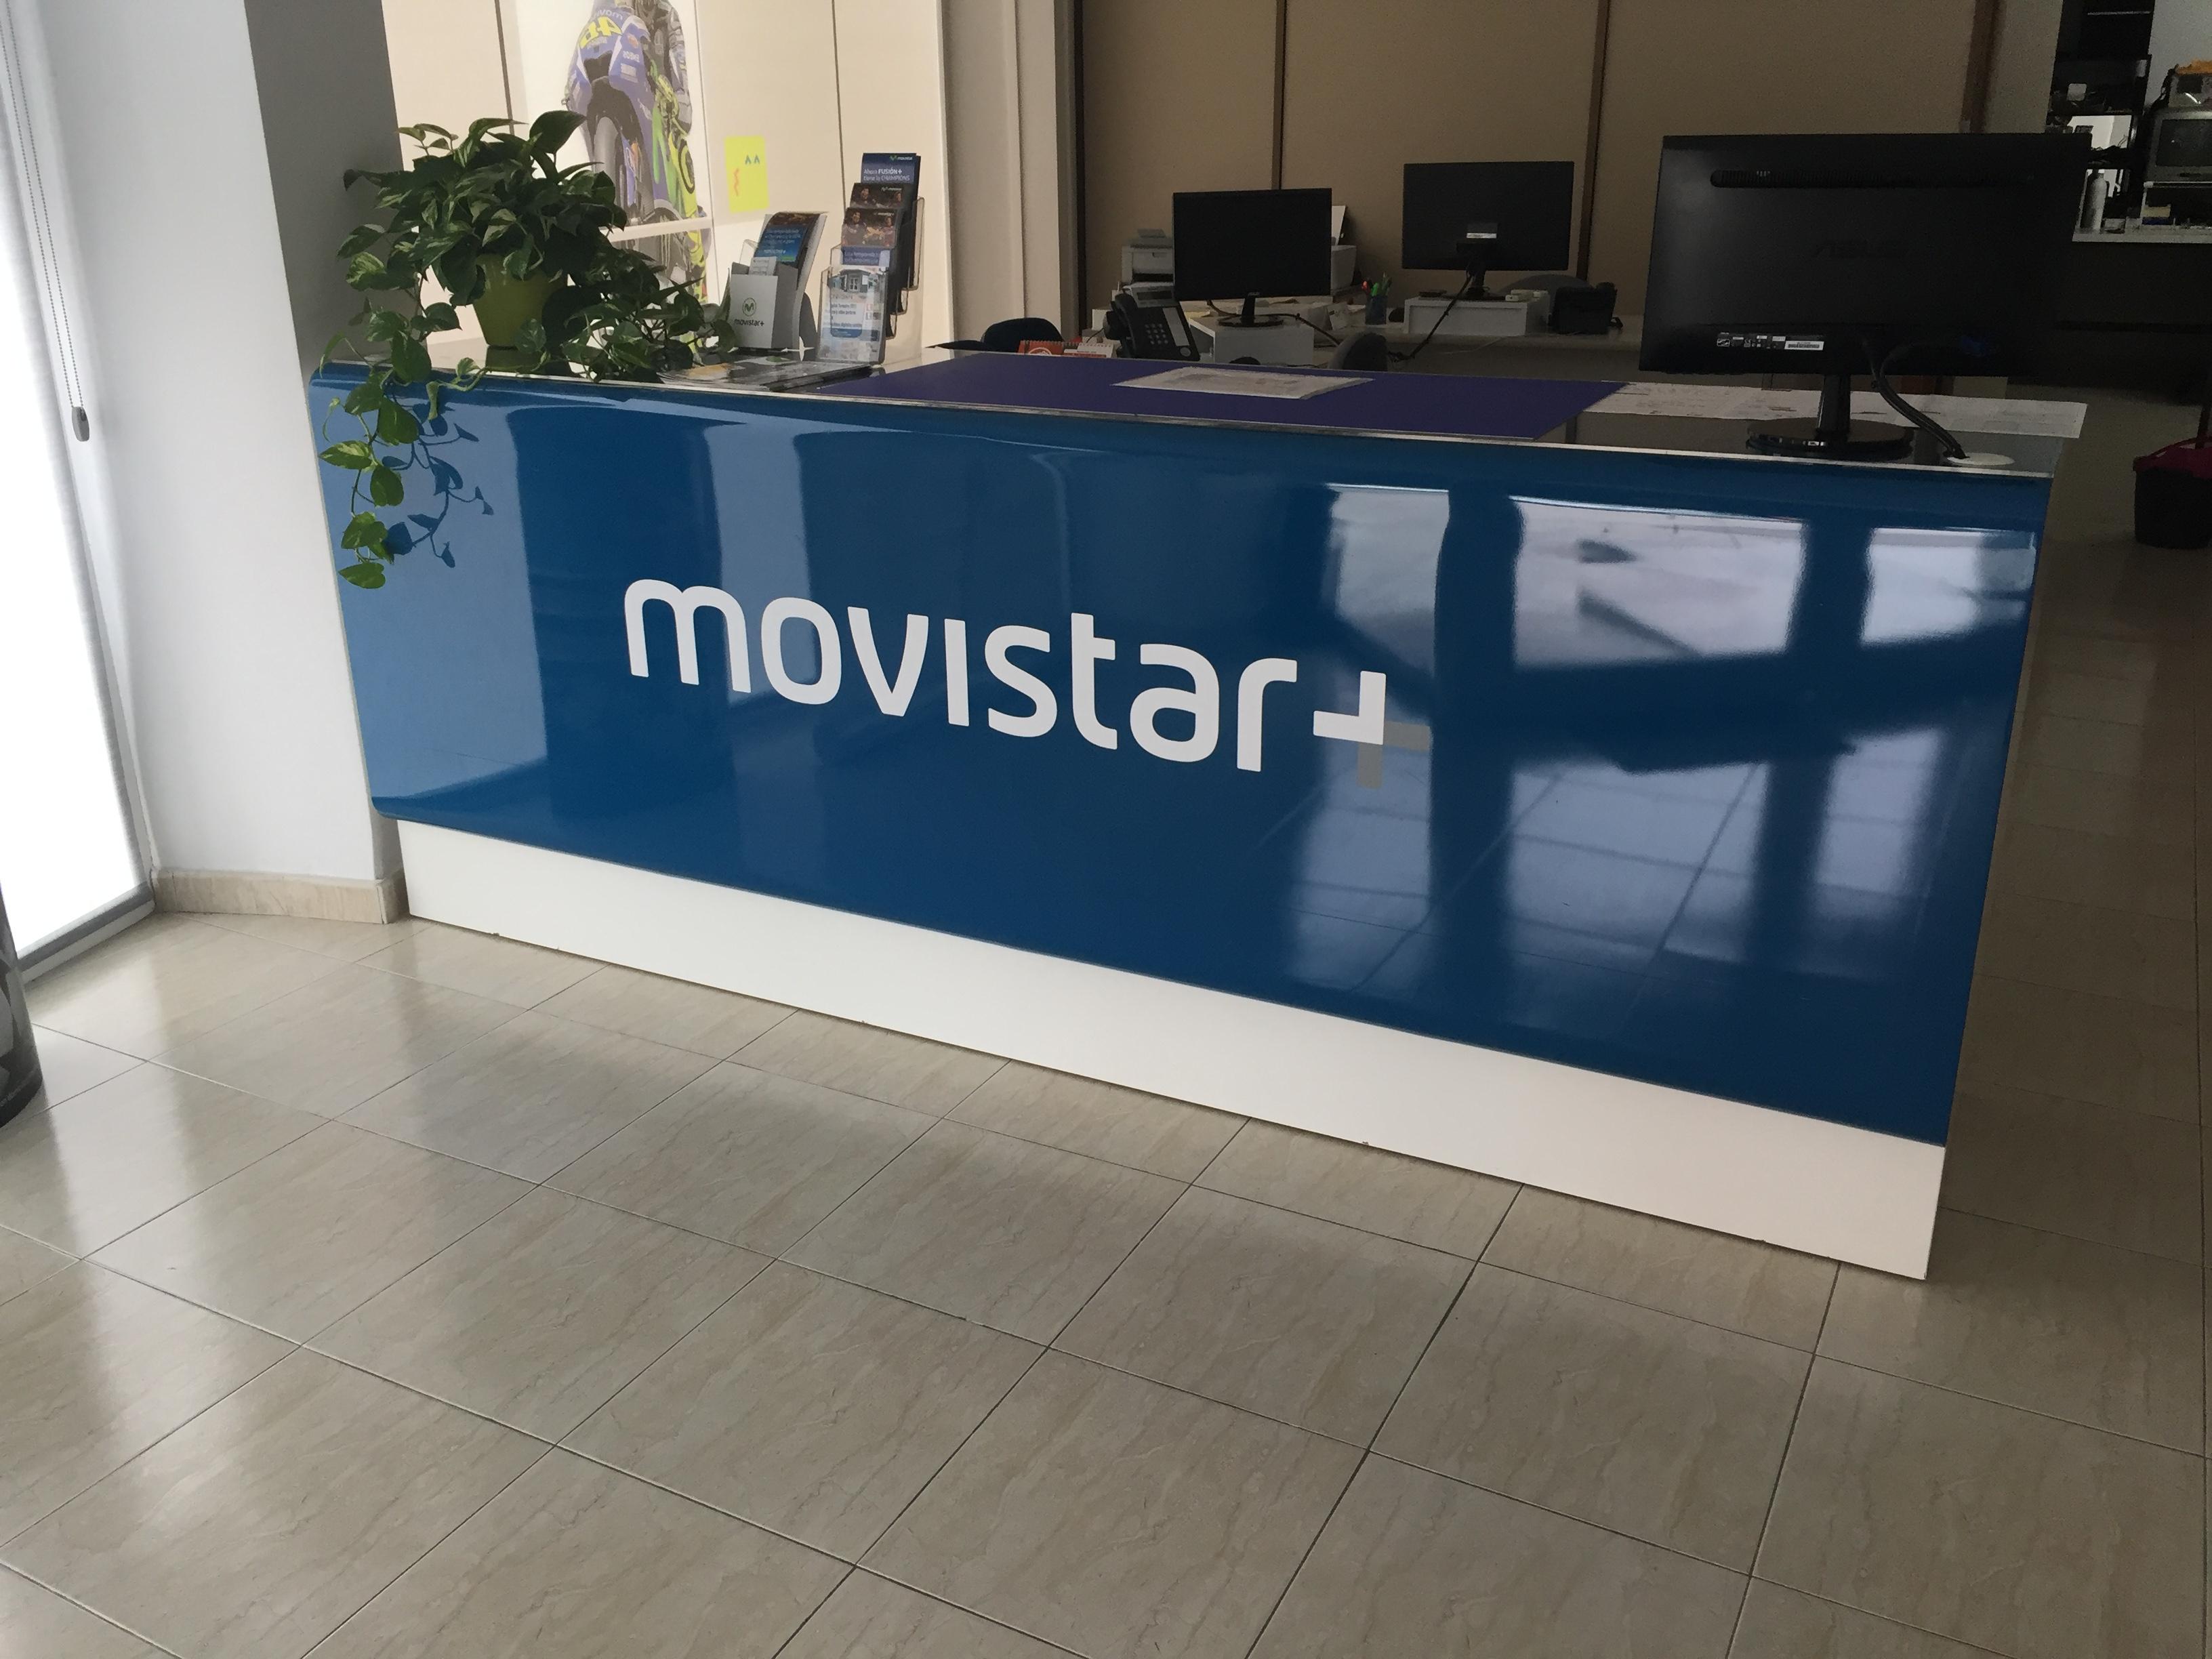 SONIVISION Movistar+